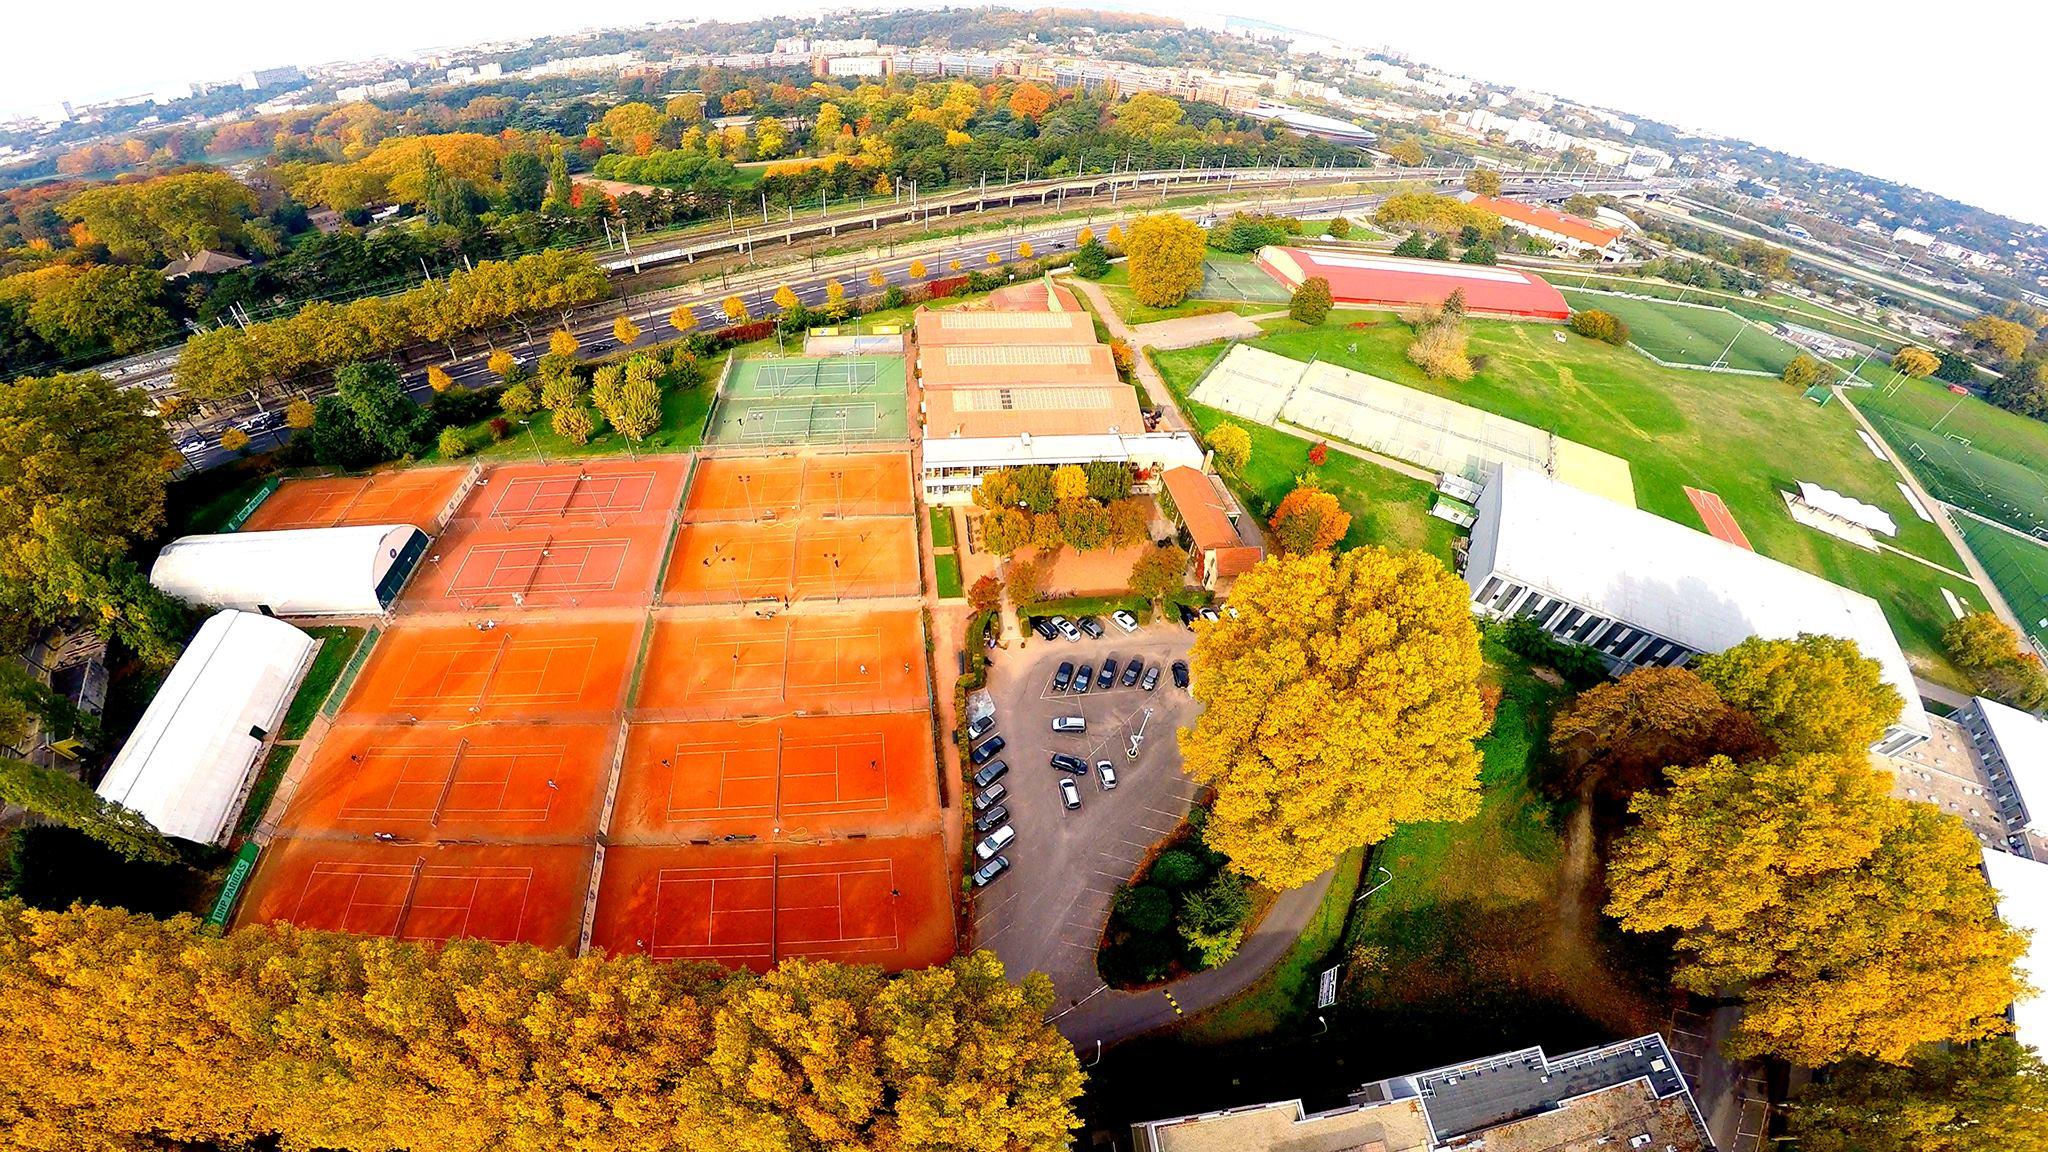 Le Tennis Club de Lyon : 2 terrains de padel